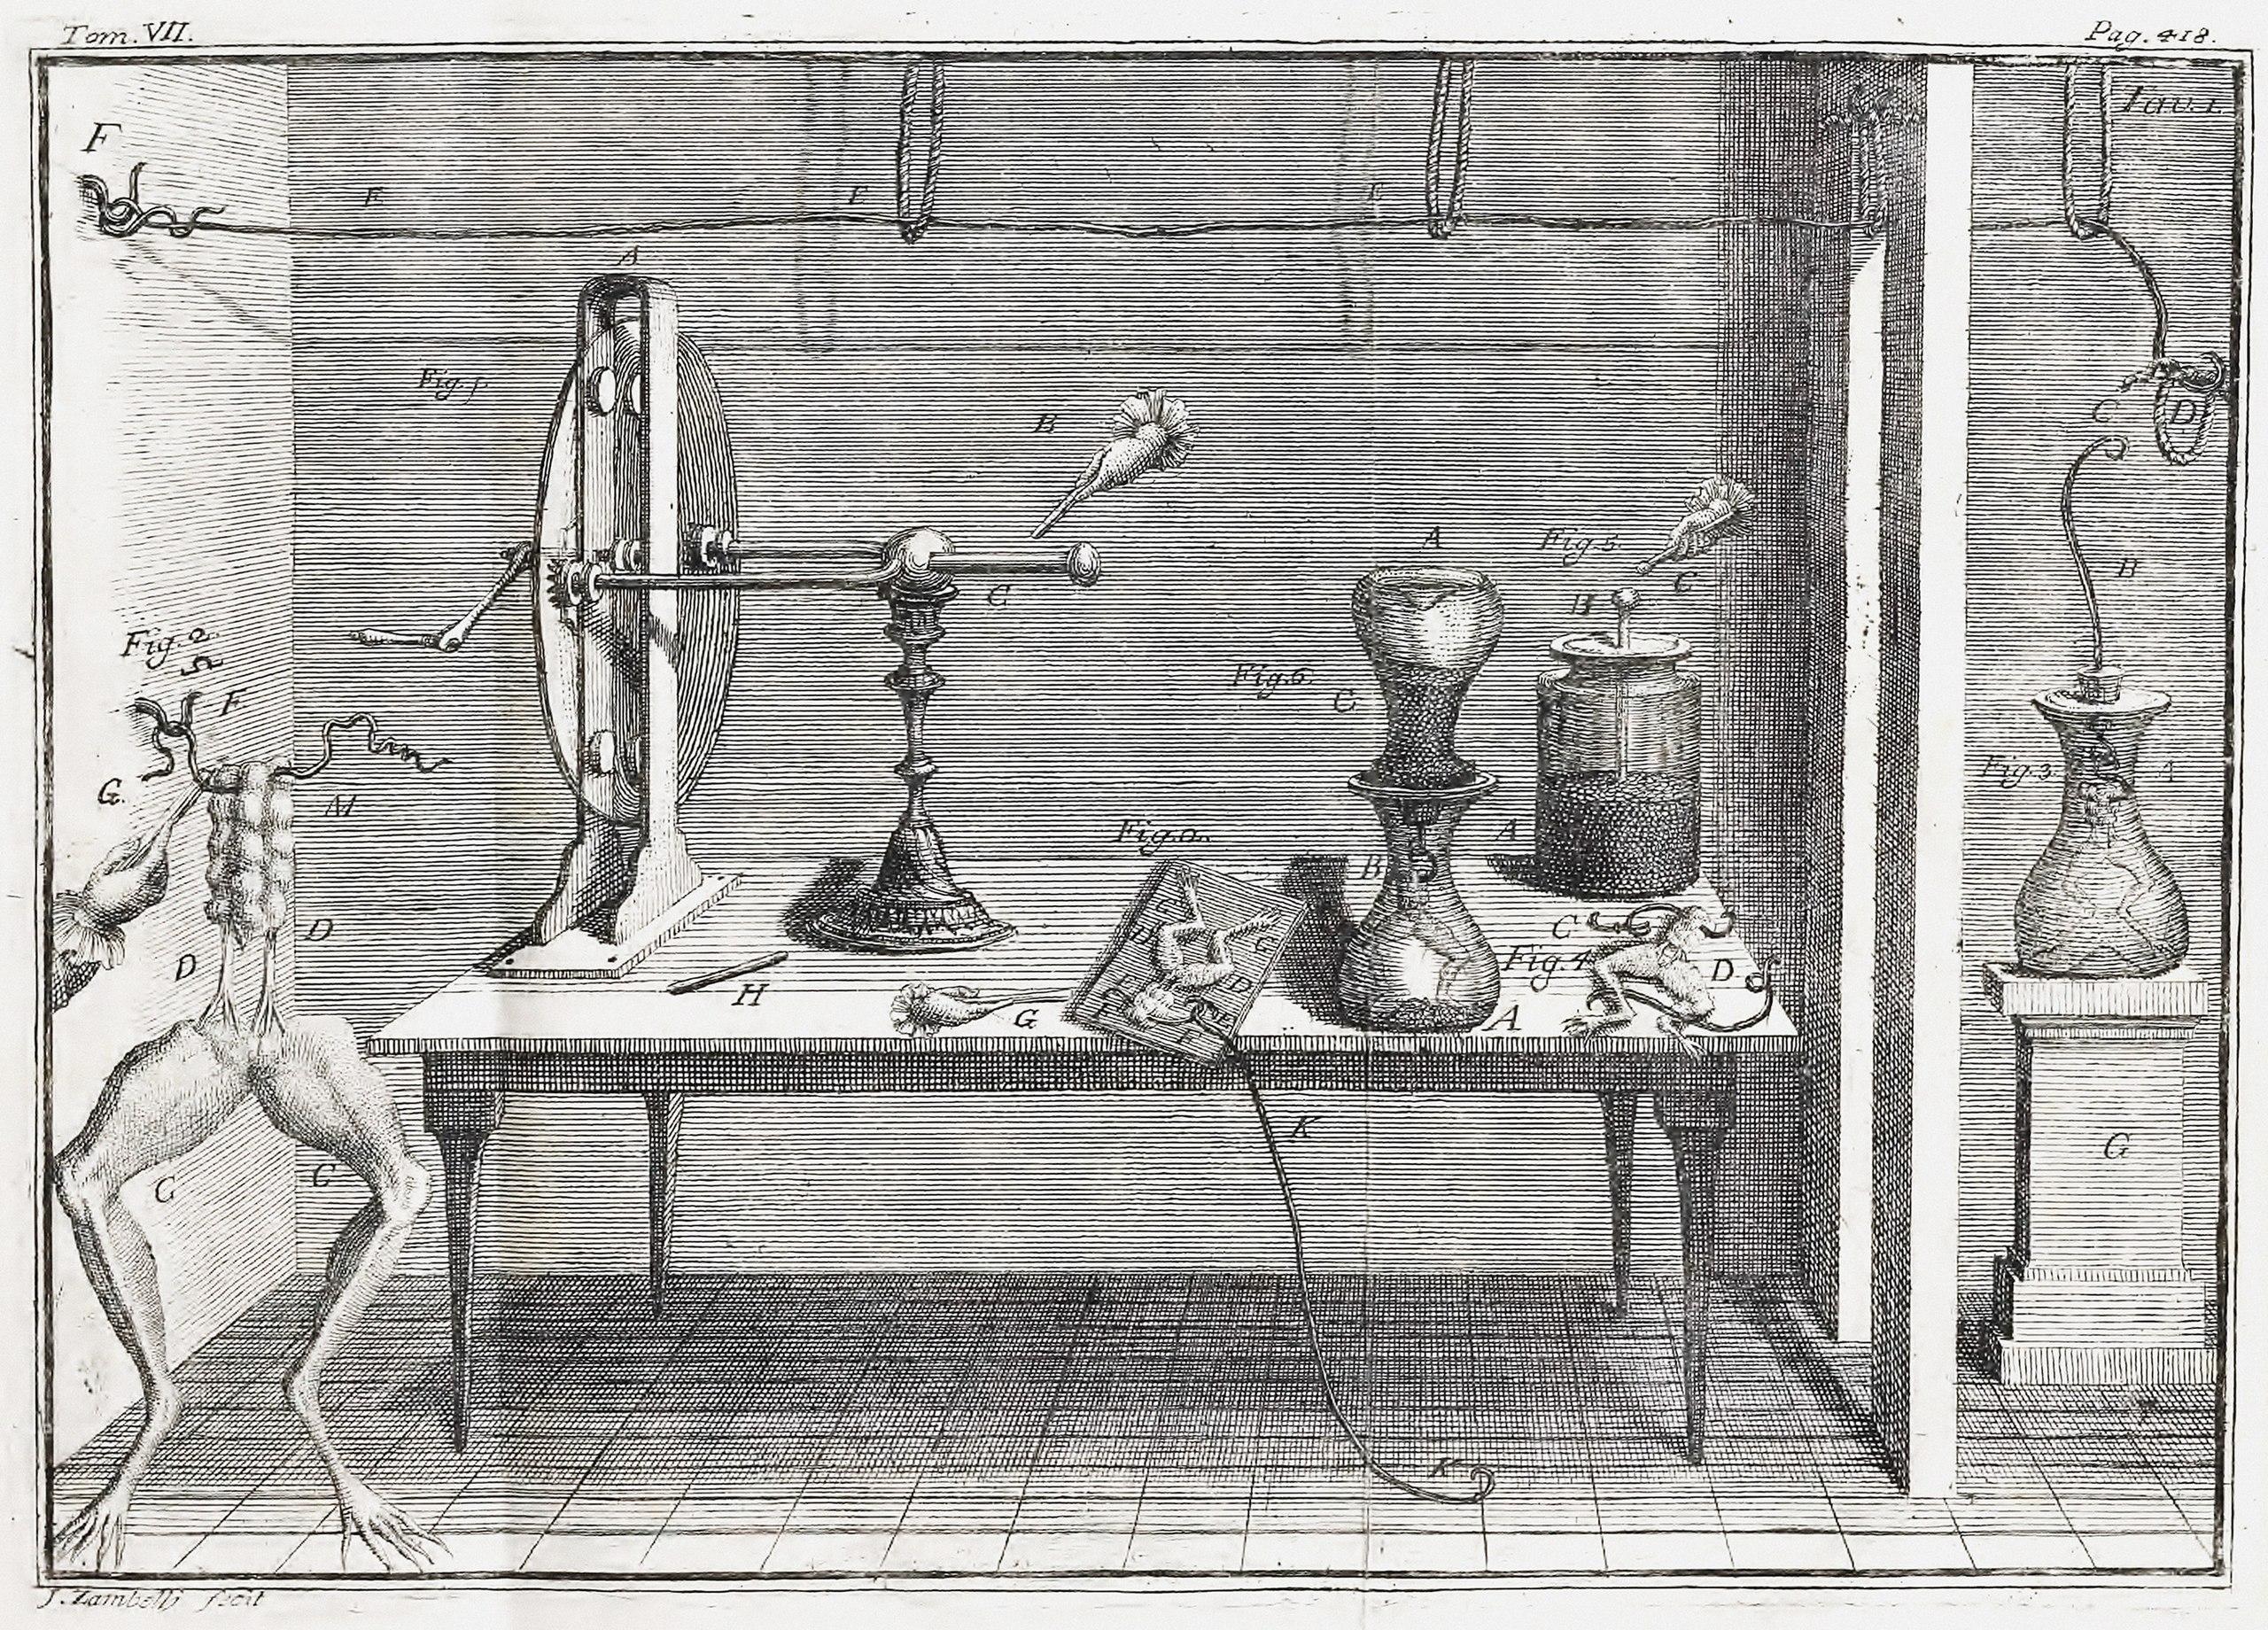 Versuchsanordnung des Froschschenkel-Experiments, aus dem De viribus electricitatis in motu musculari